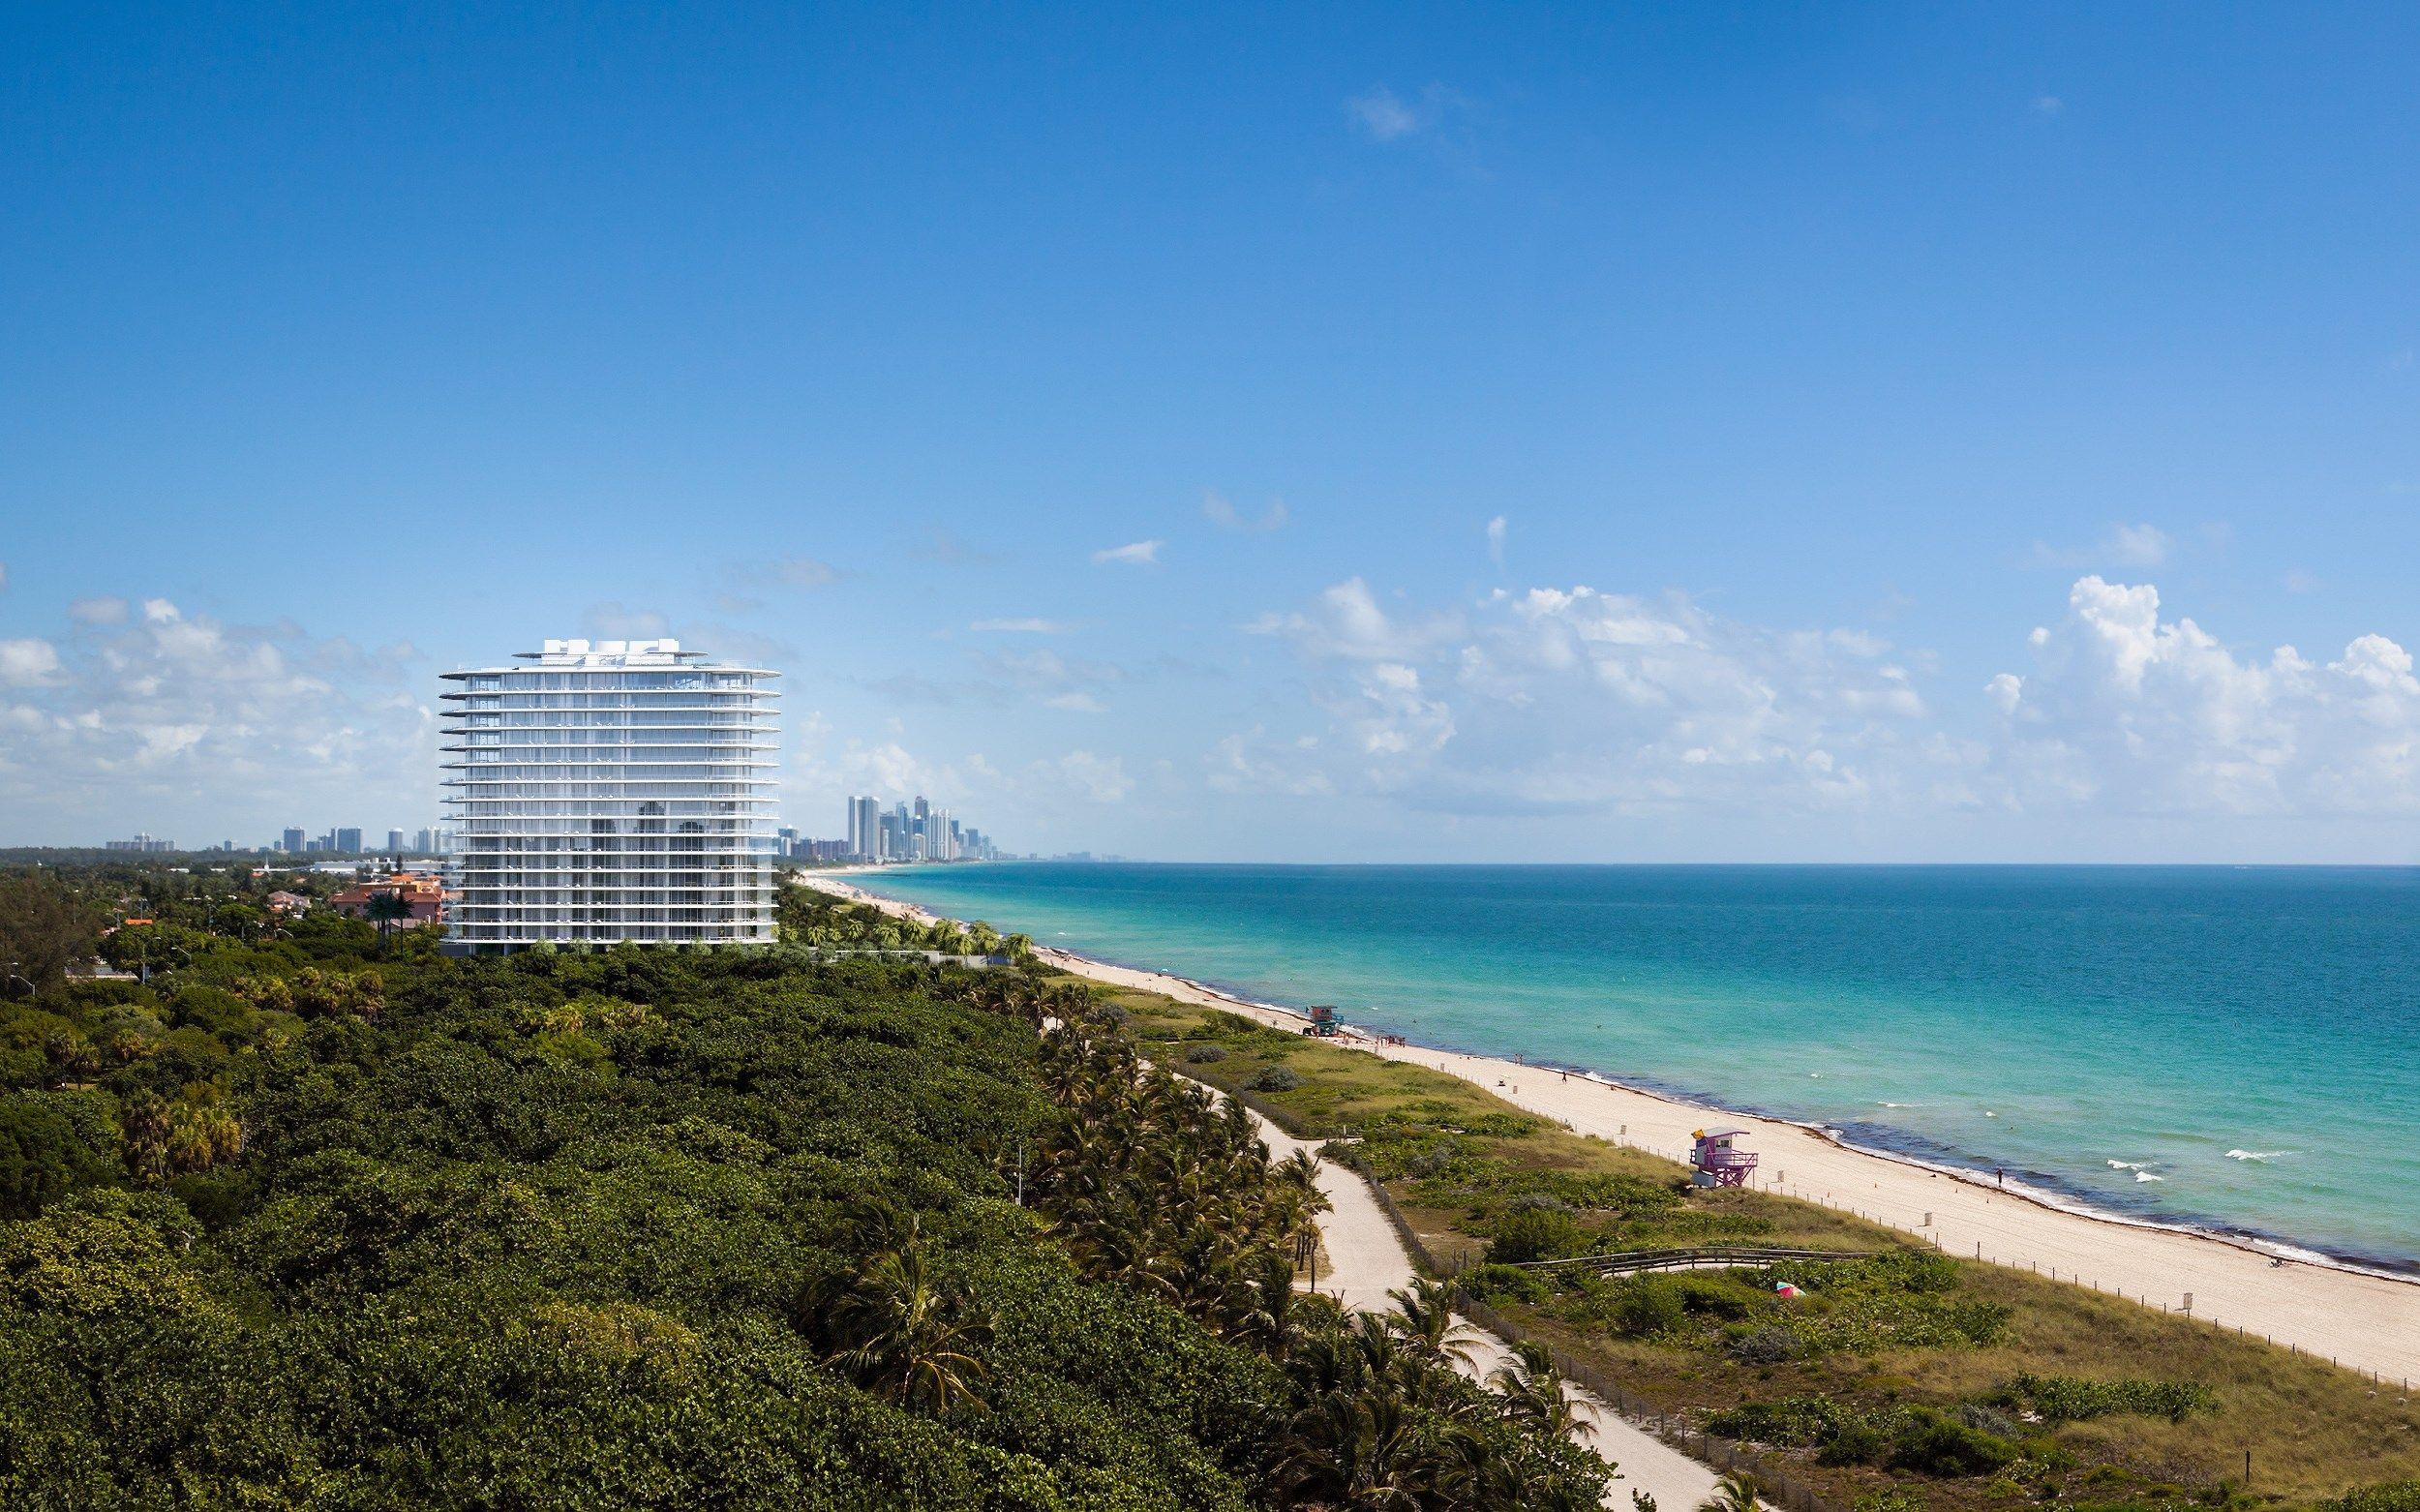 Eighty Seven Park Condominium, Miami, Florida, United States - Renzo Piano